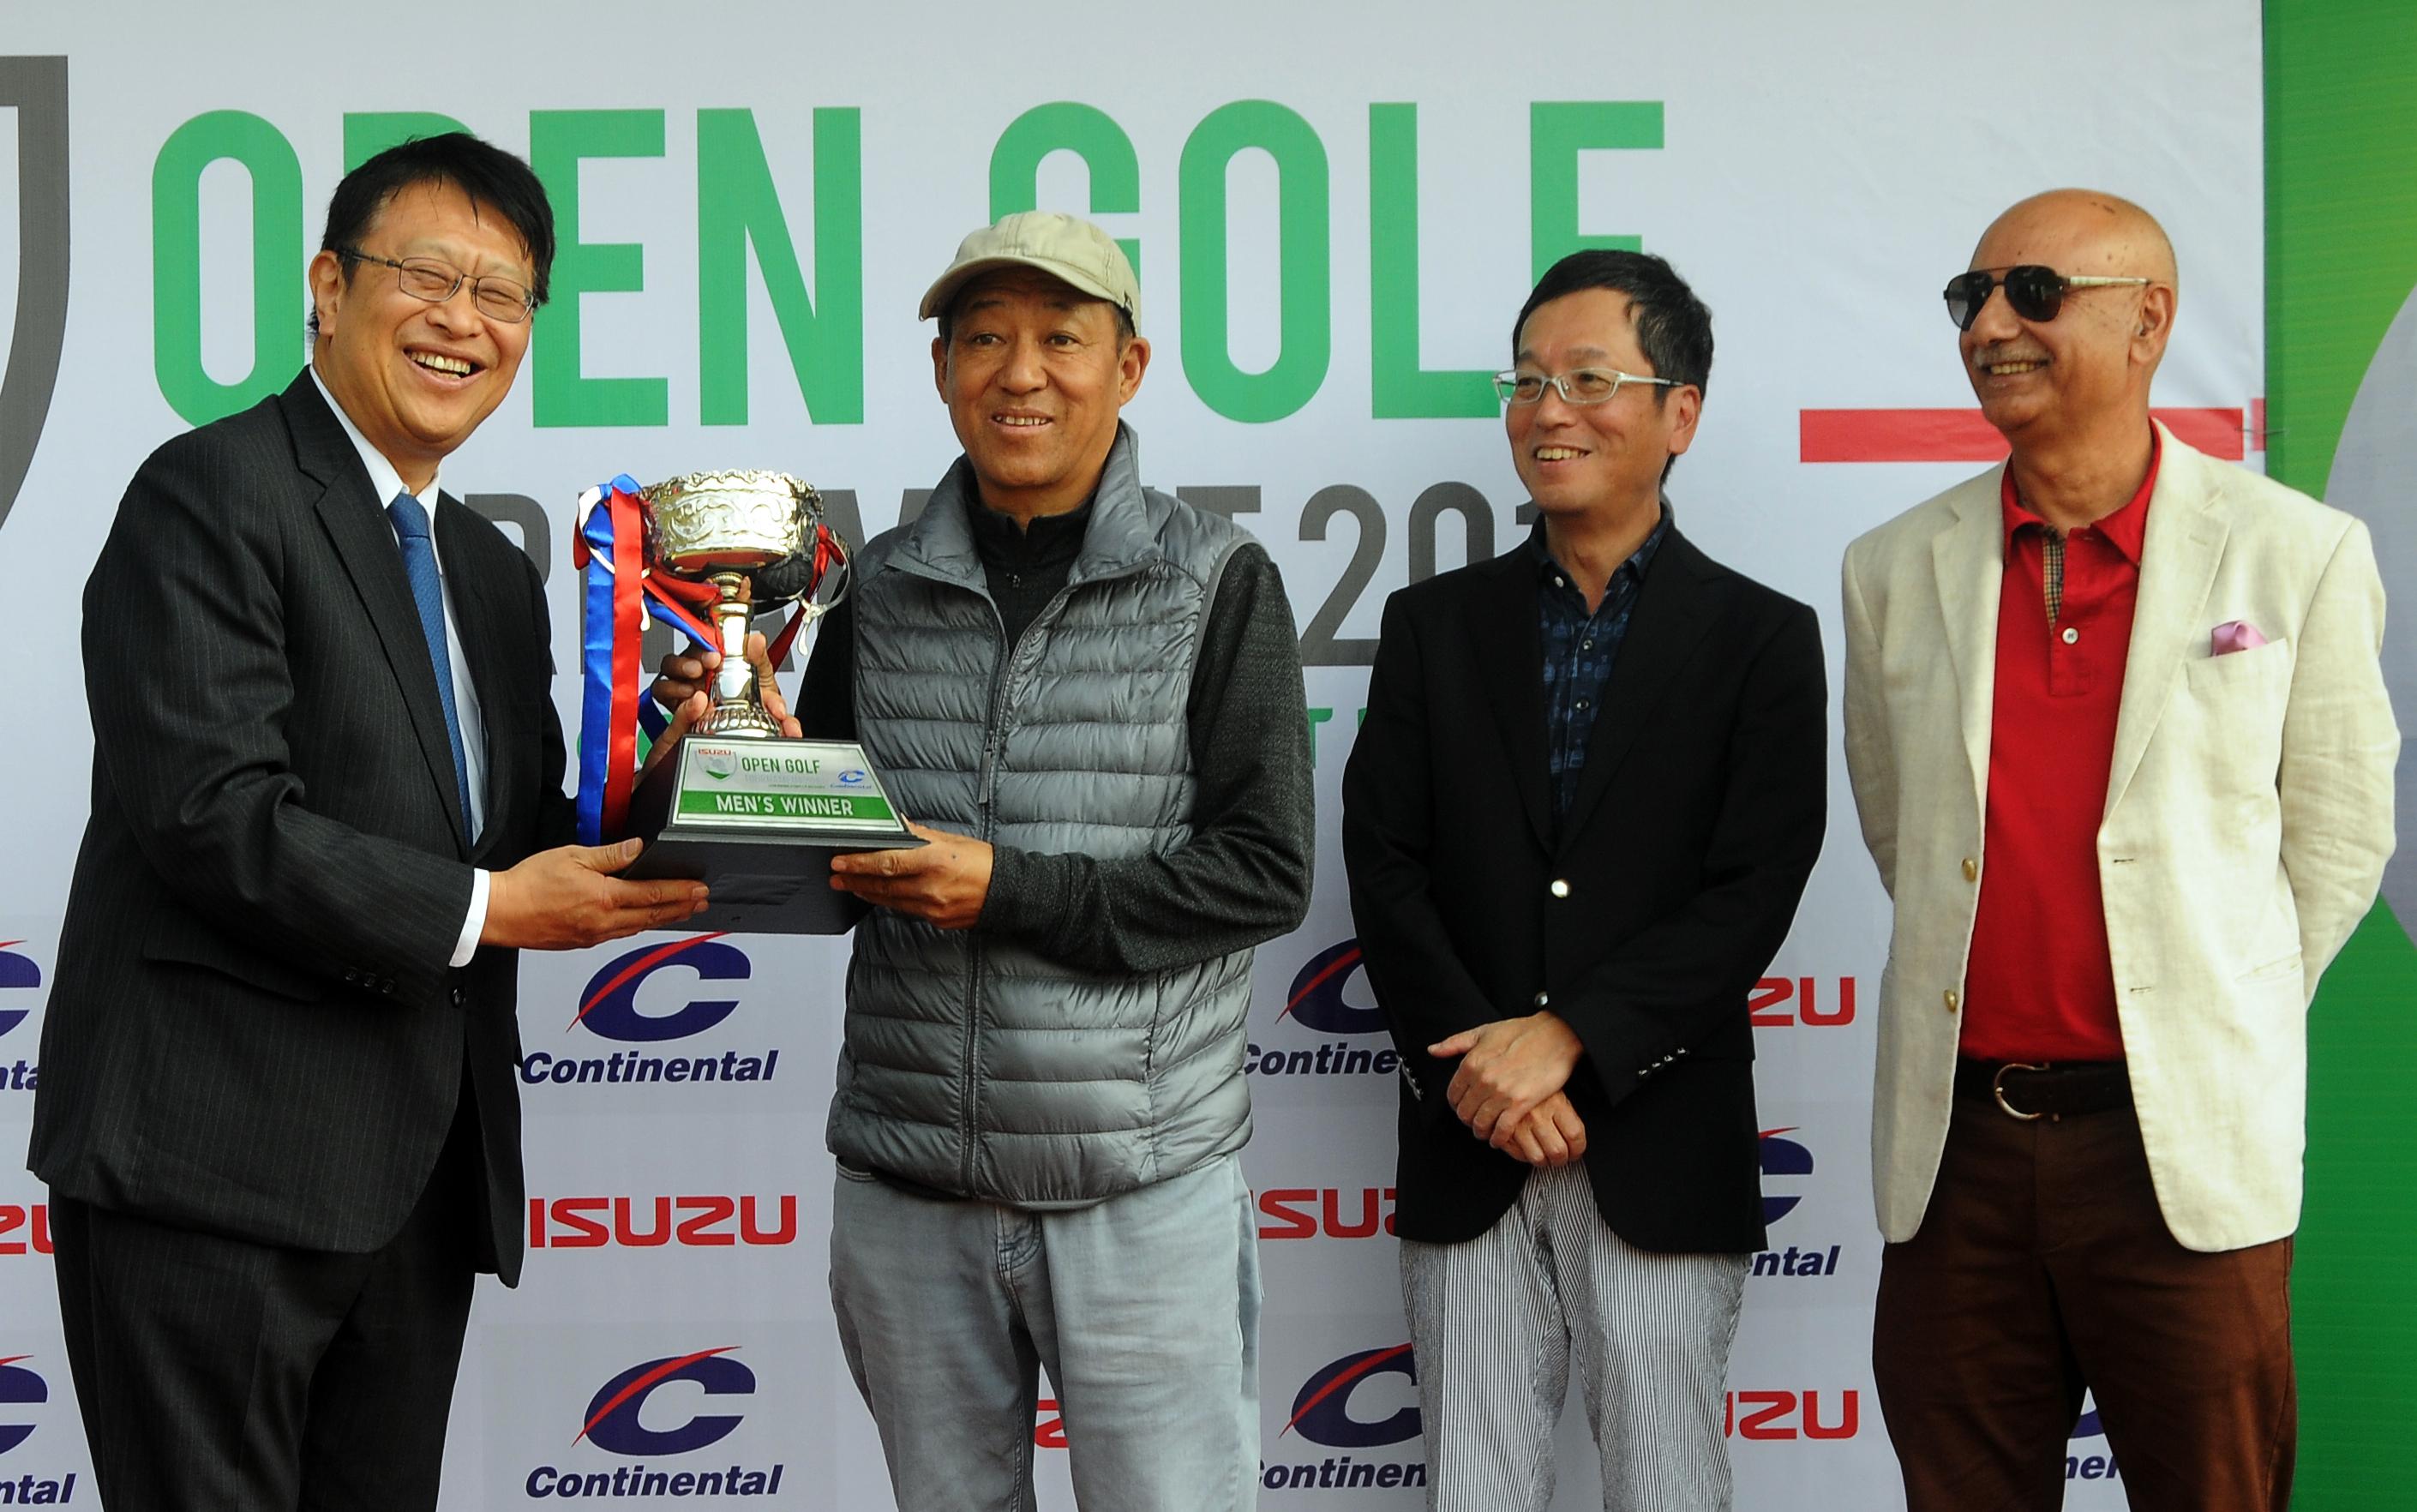 Japanese Ambassador to Nepal Masamiki Saigo (left) handing over the winneru2019s trophy to Tendi Sherpa after the Isuzu Open Golf Tournament at the Gokarna Golf Club in Kathmandu on Saturday. Photo: THT